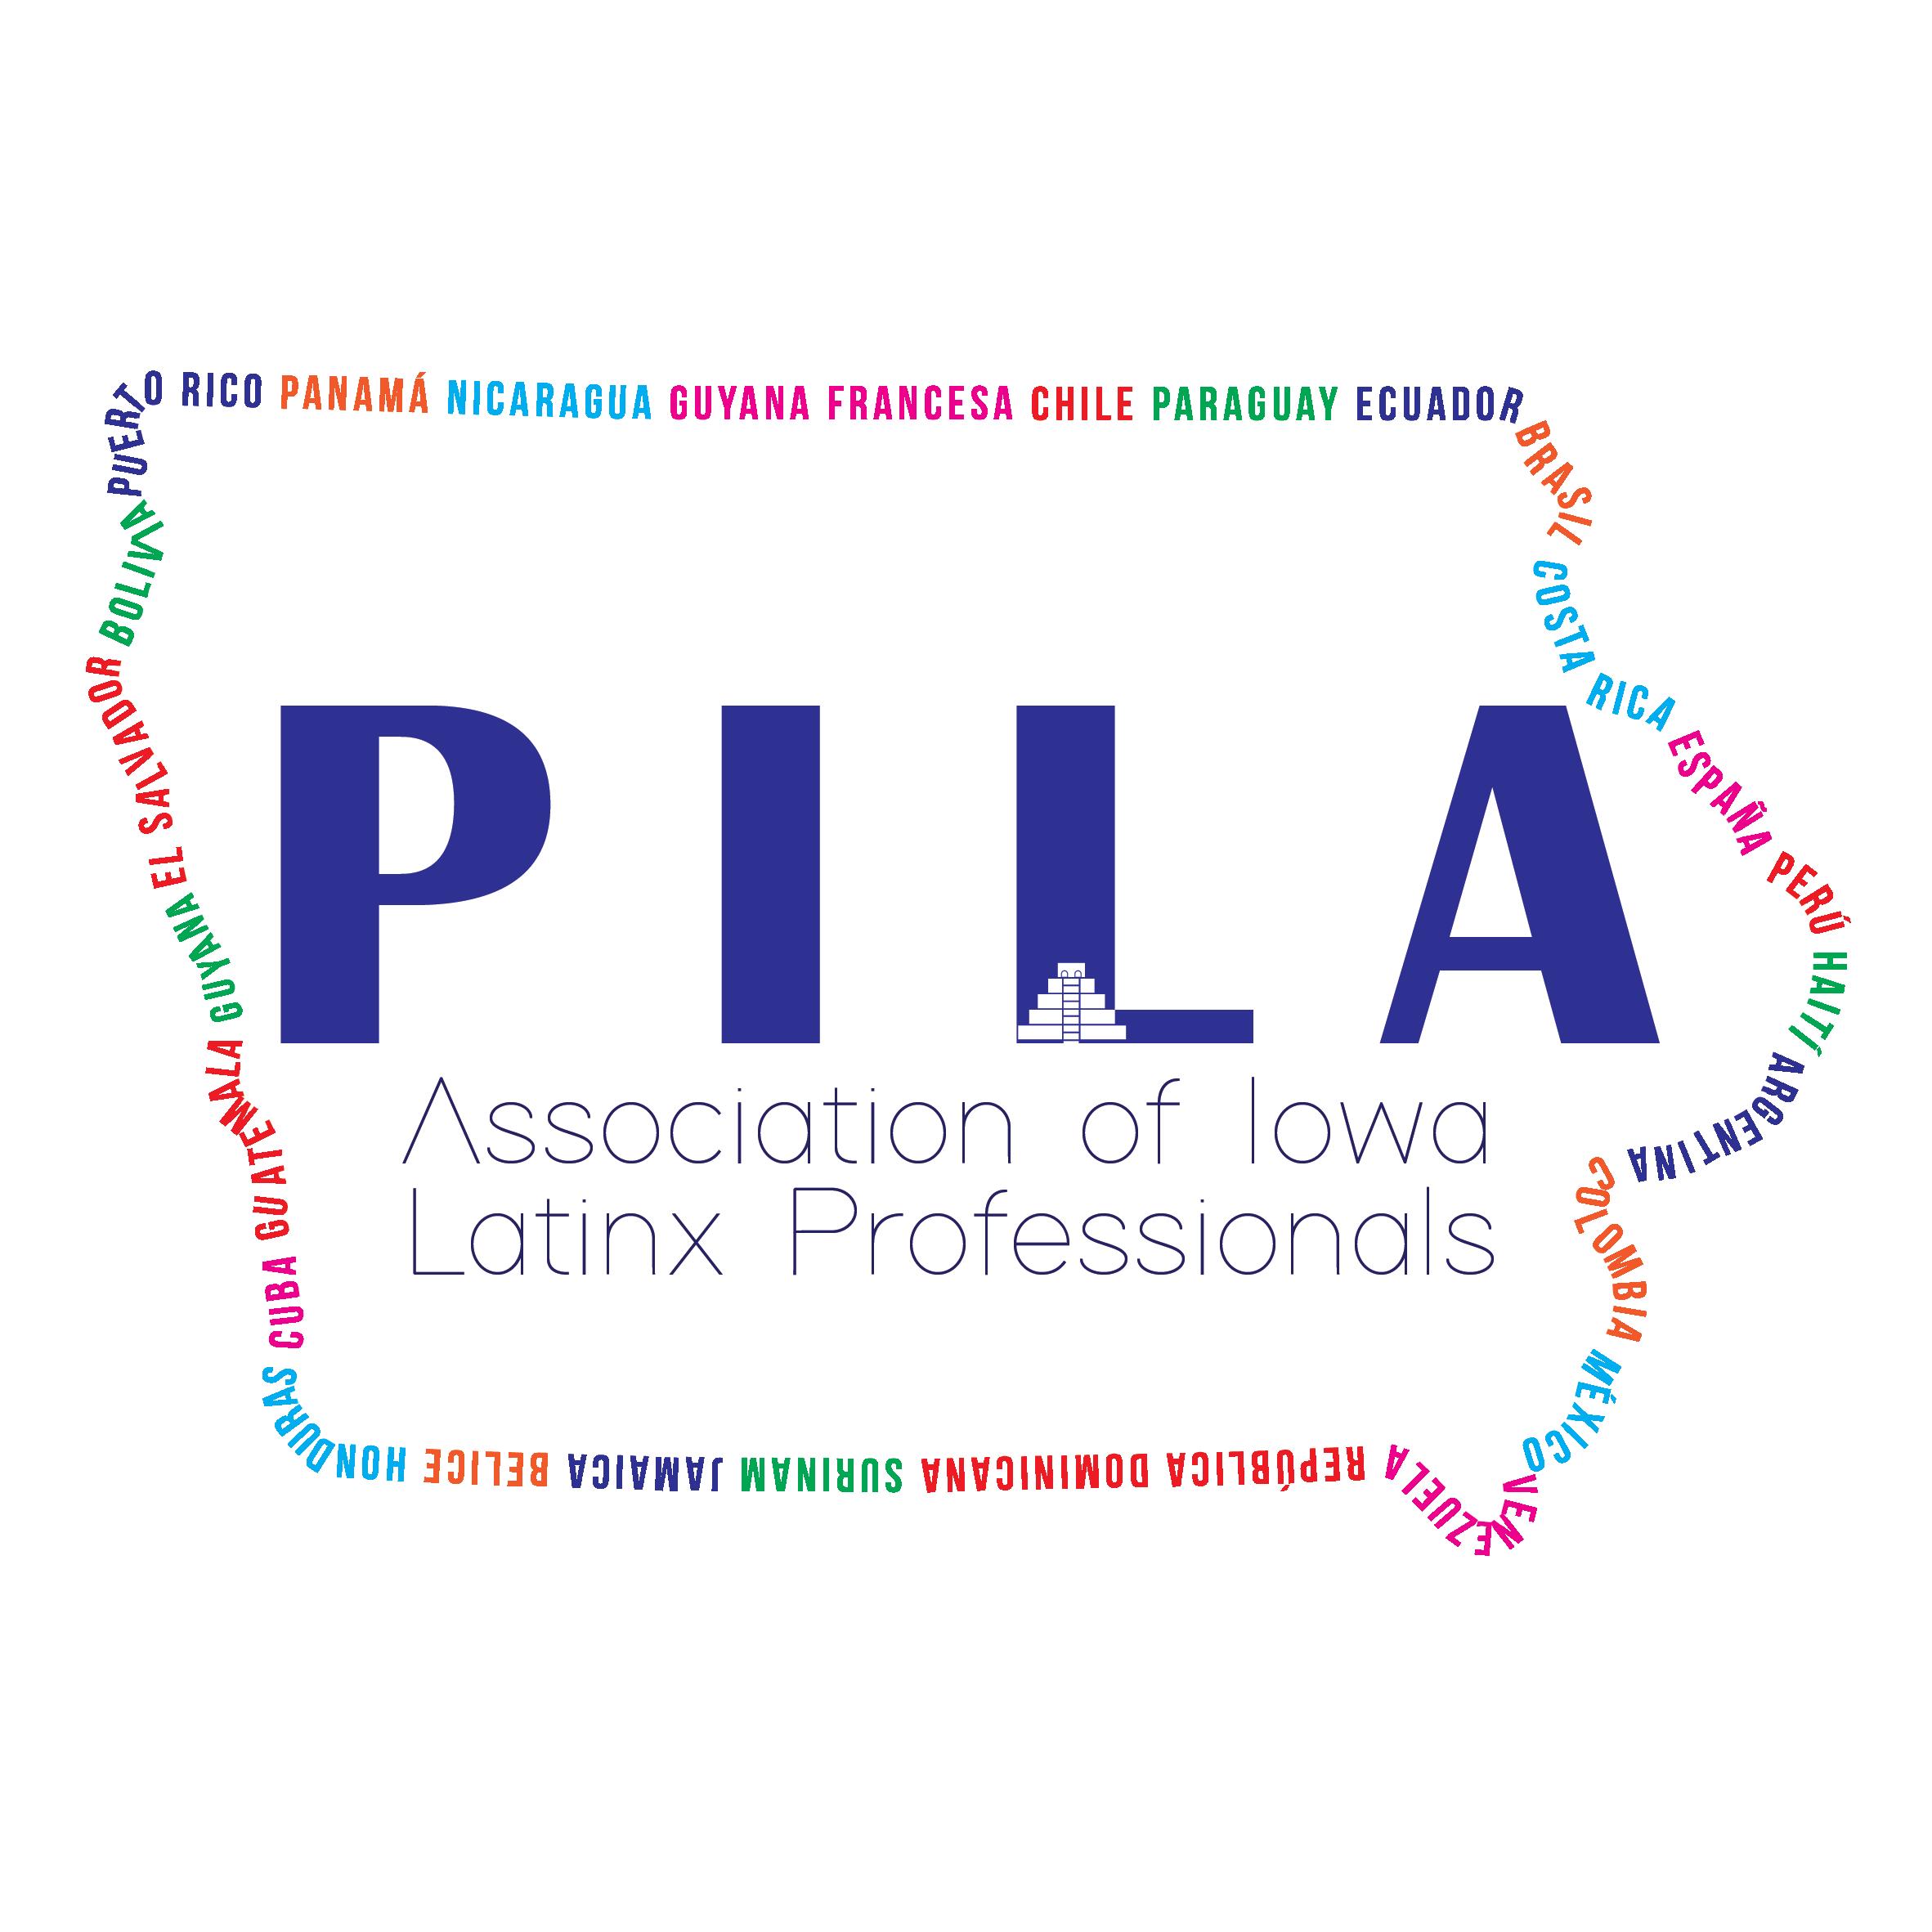 Association of Iowa Latinx Professionals